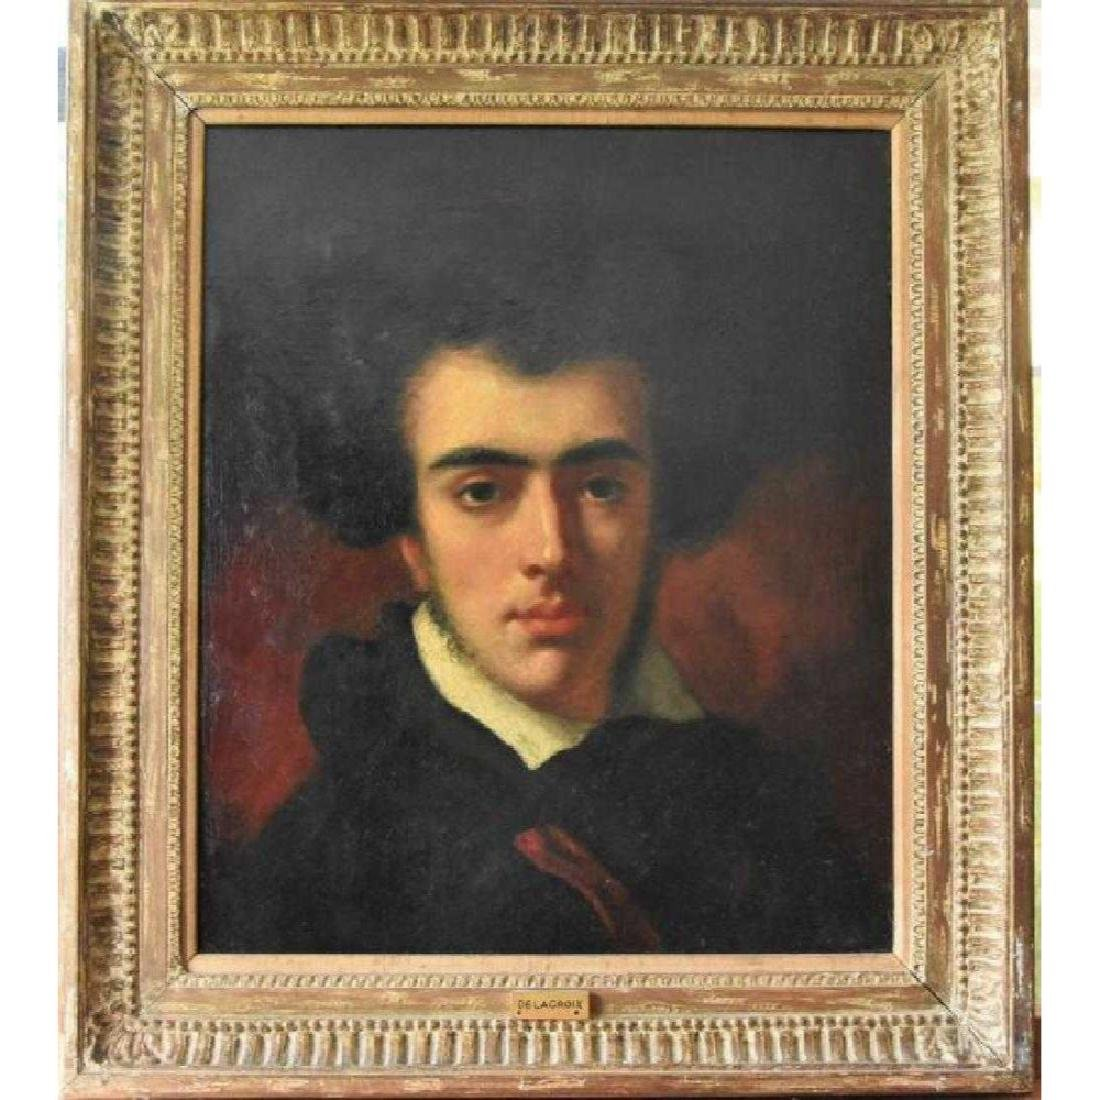 Eugene Delacroix original oil on canvas